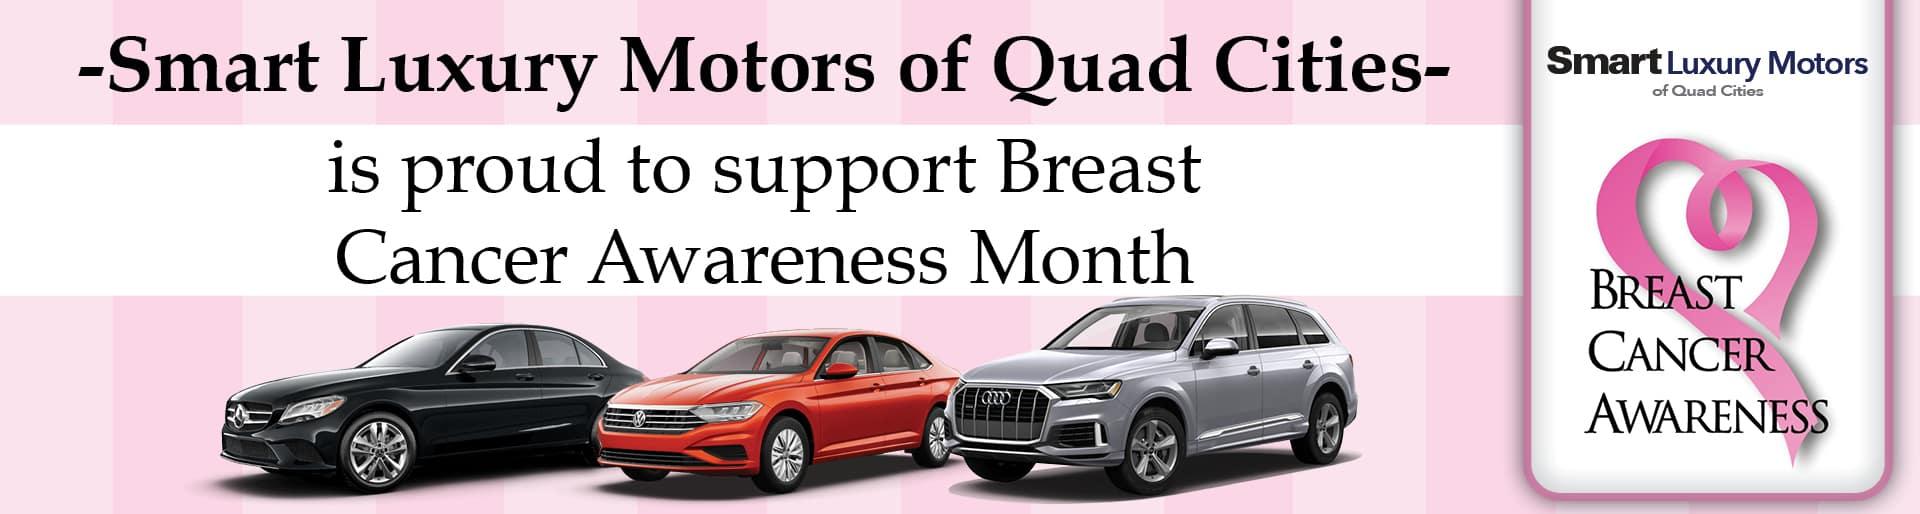 Breast Cancer Awareness Banner